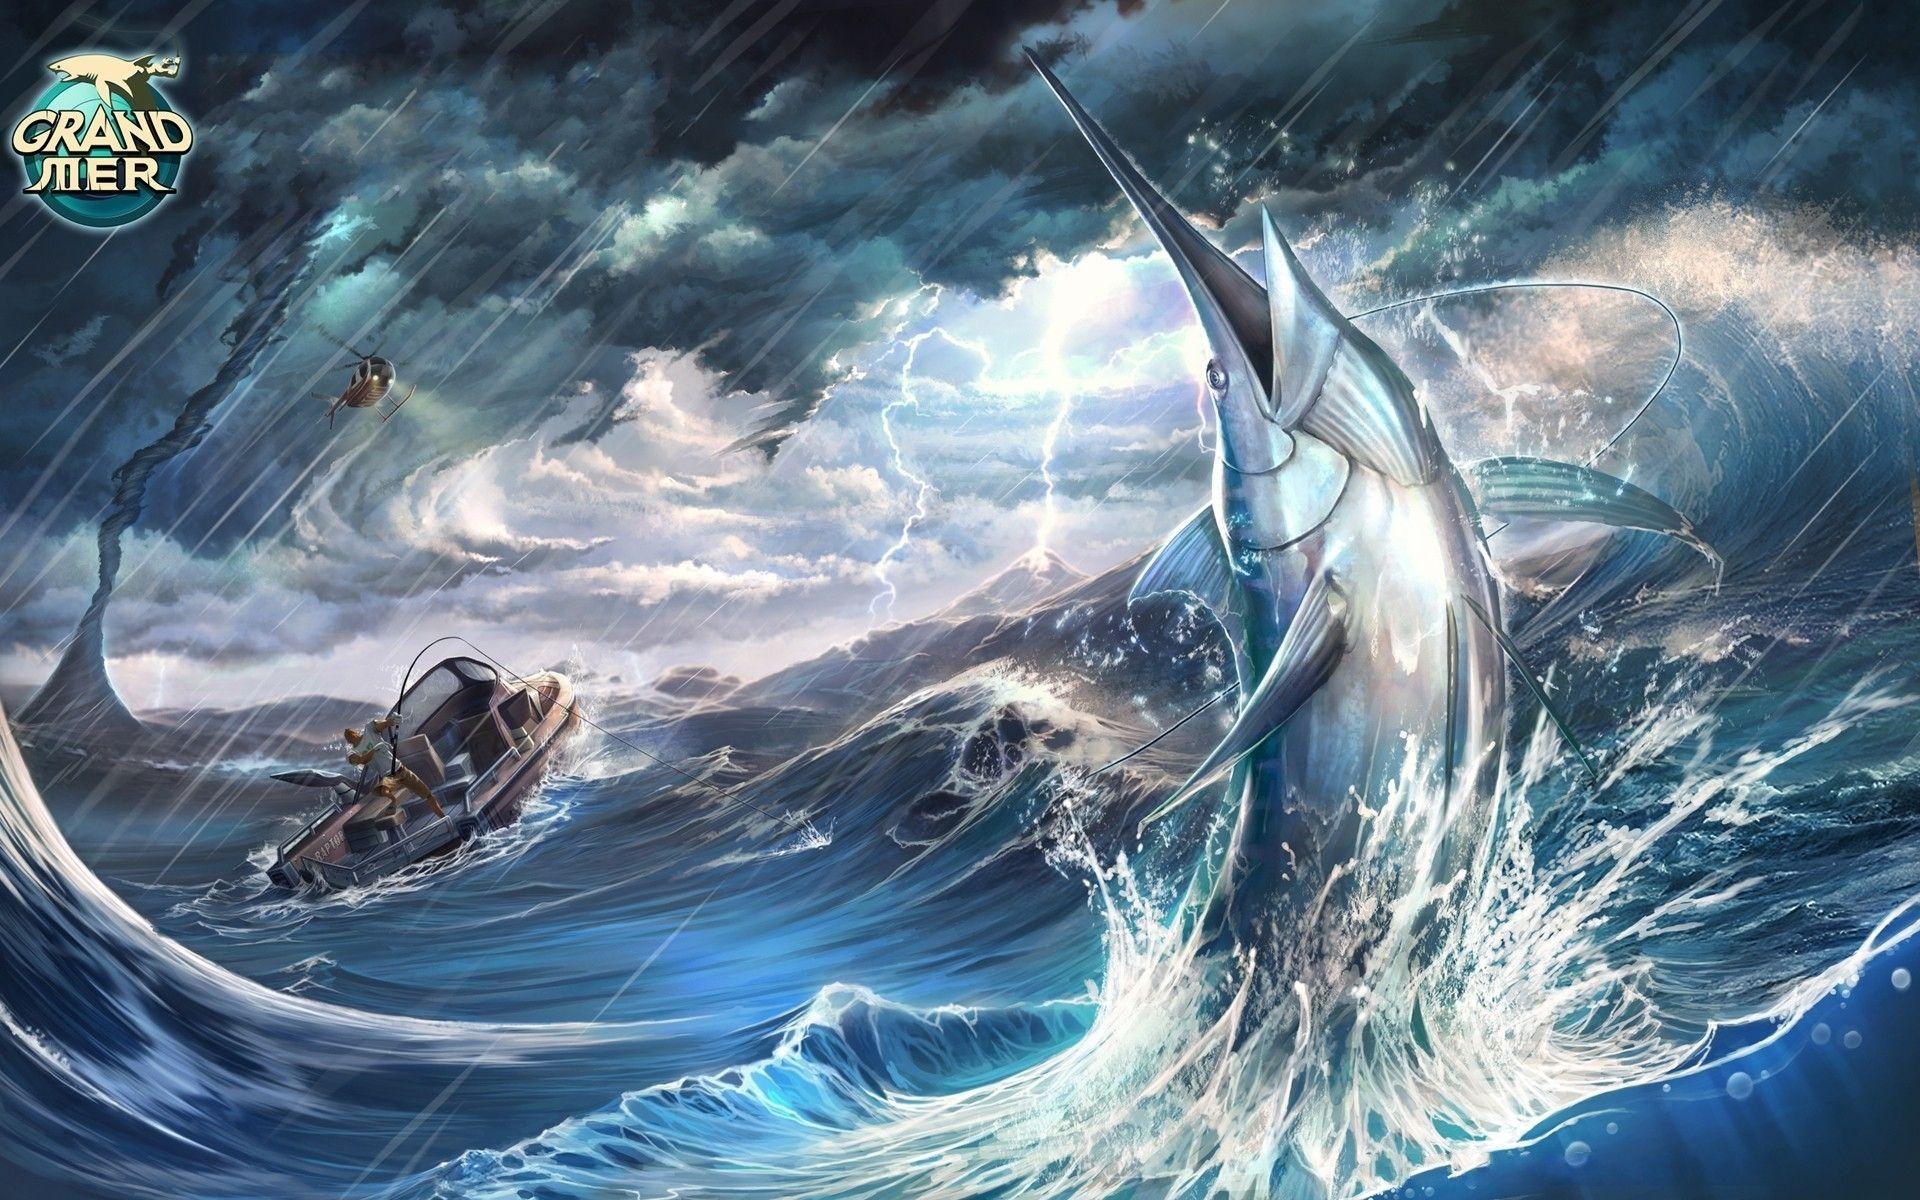 Fish marlin Animals storm ocean sea fishing rain wallpaper 1920x1200